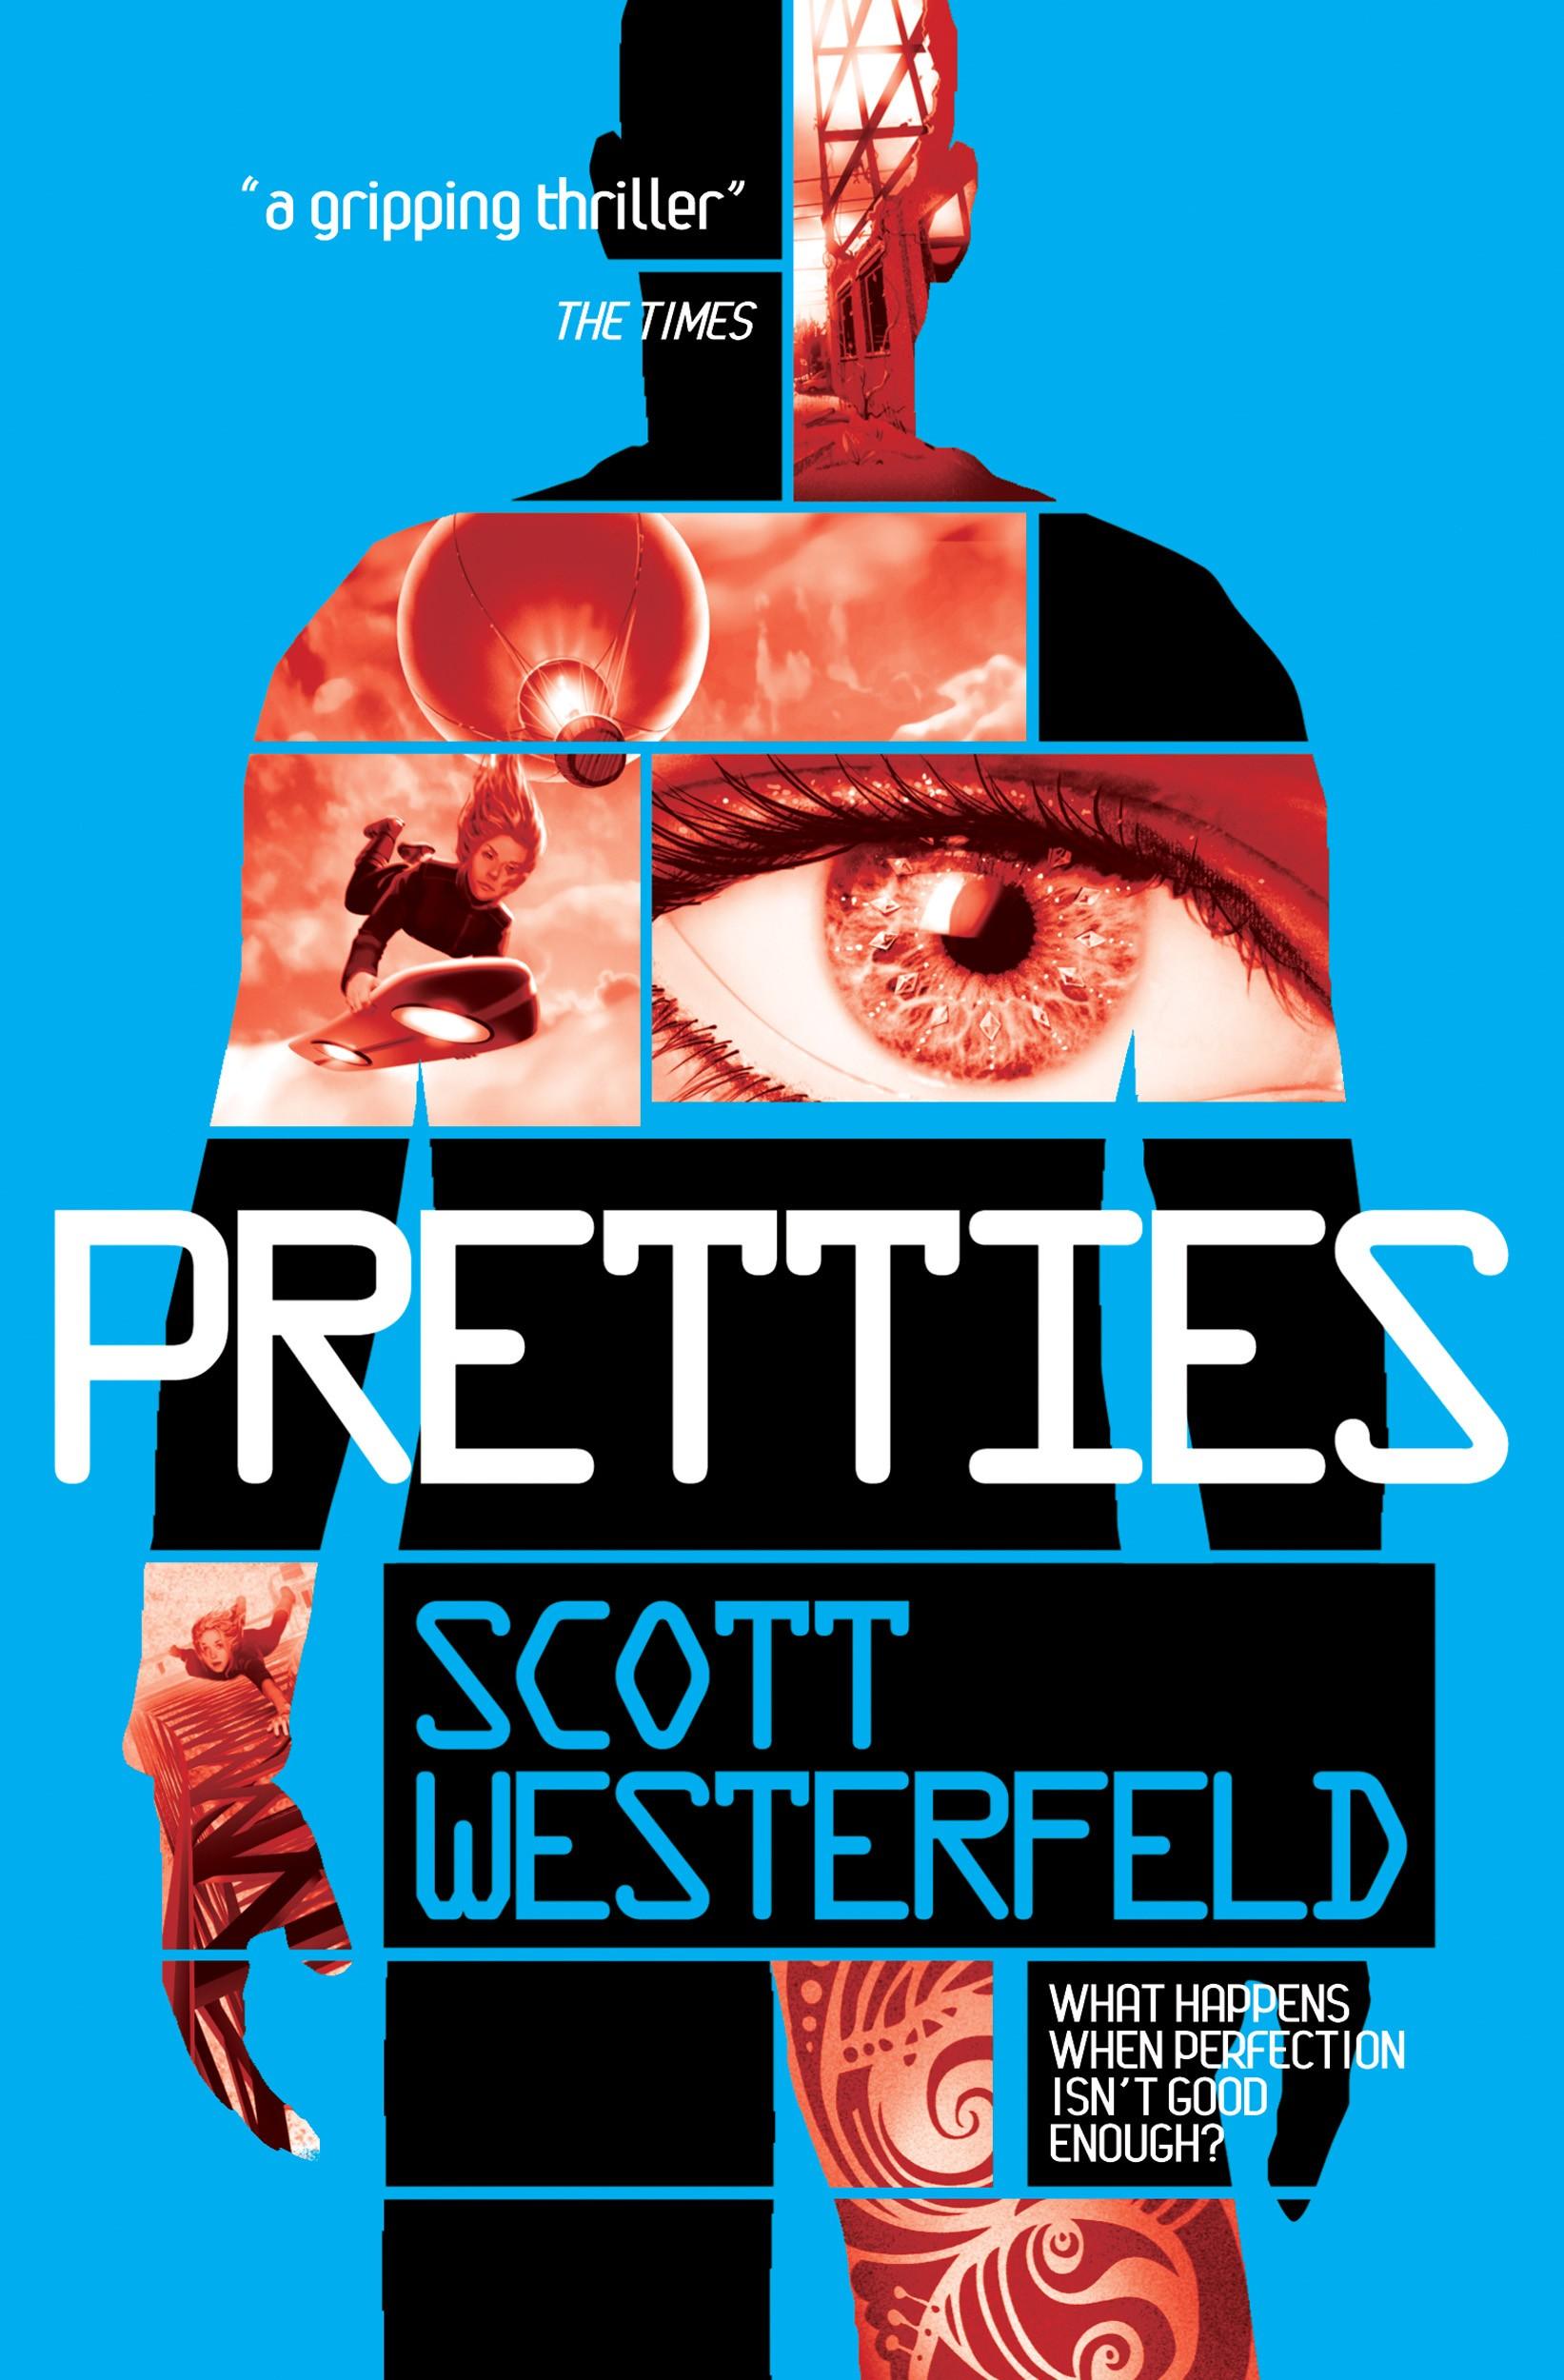 http://thebooksmugglers.com/wp-content/uploads/2009/12/Pretties-300dpi.jpg